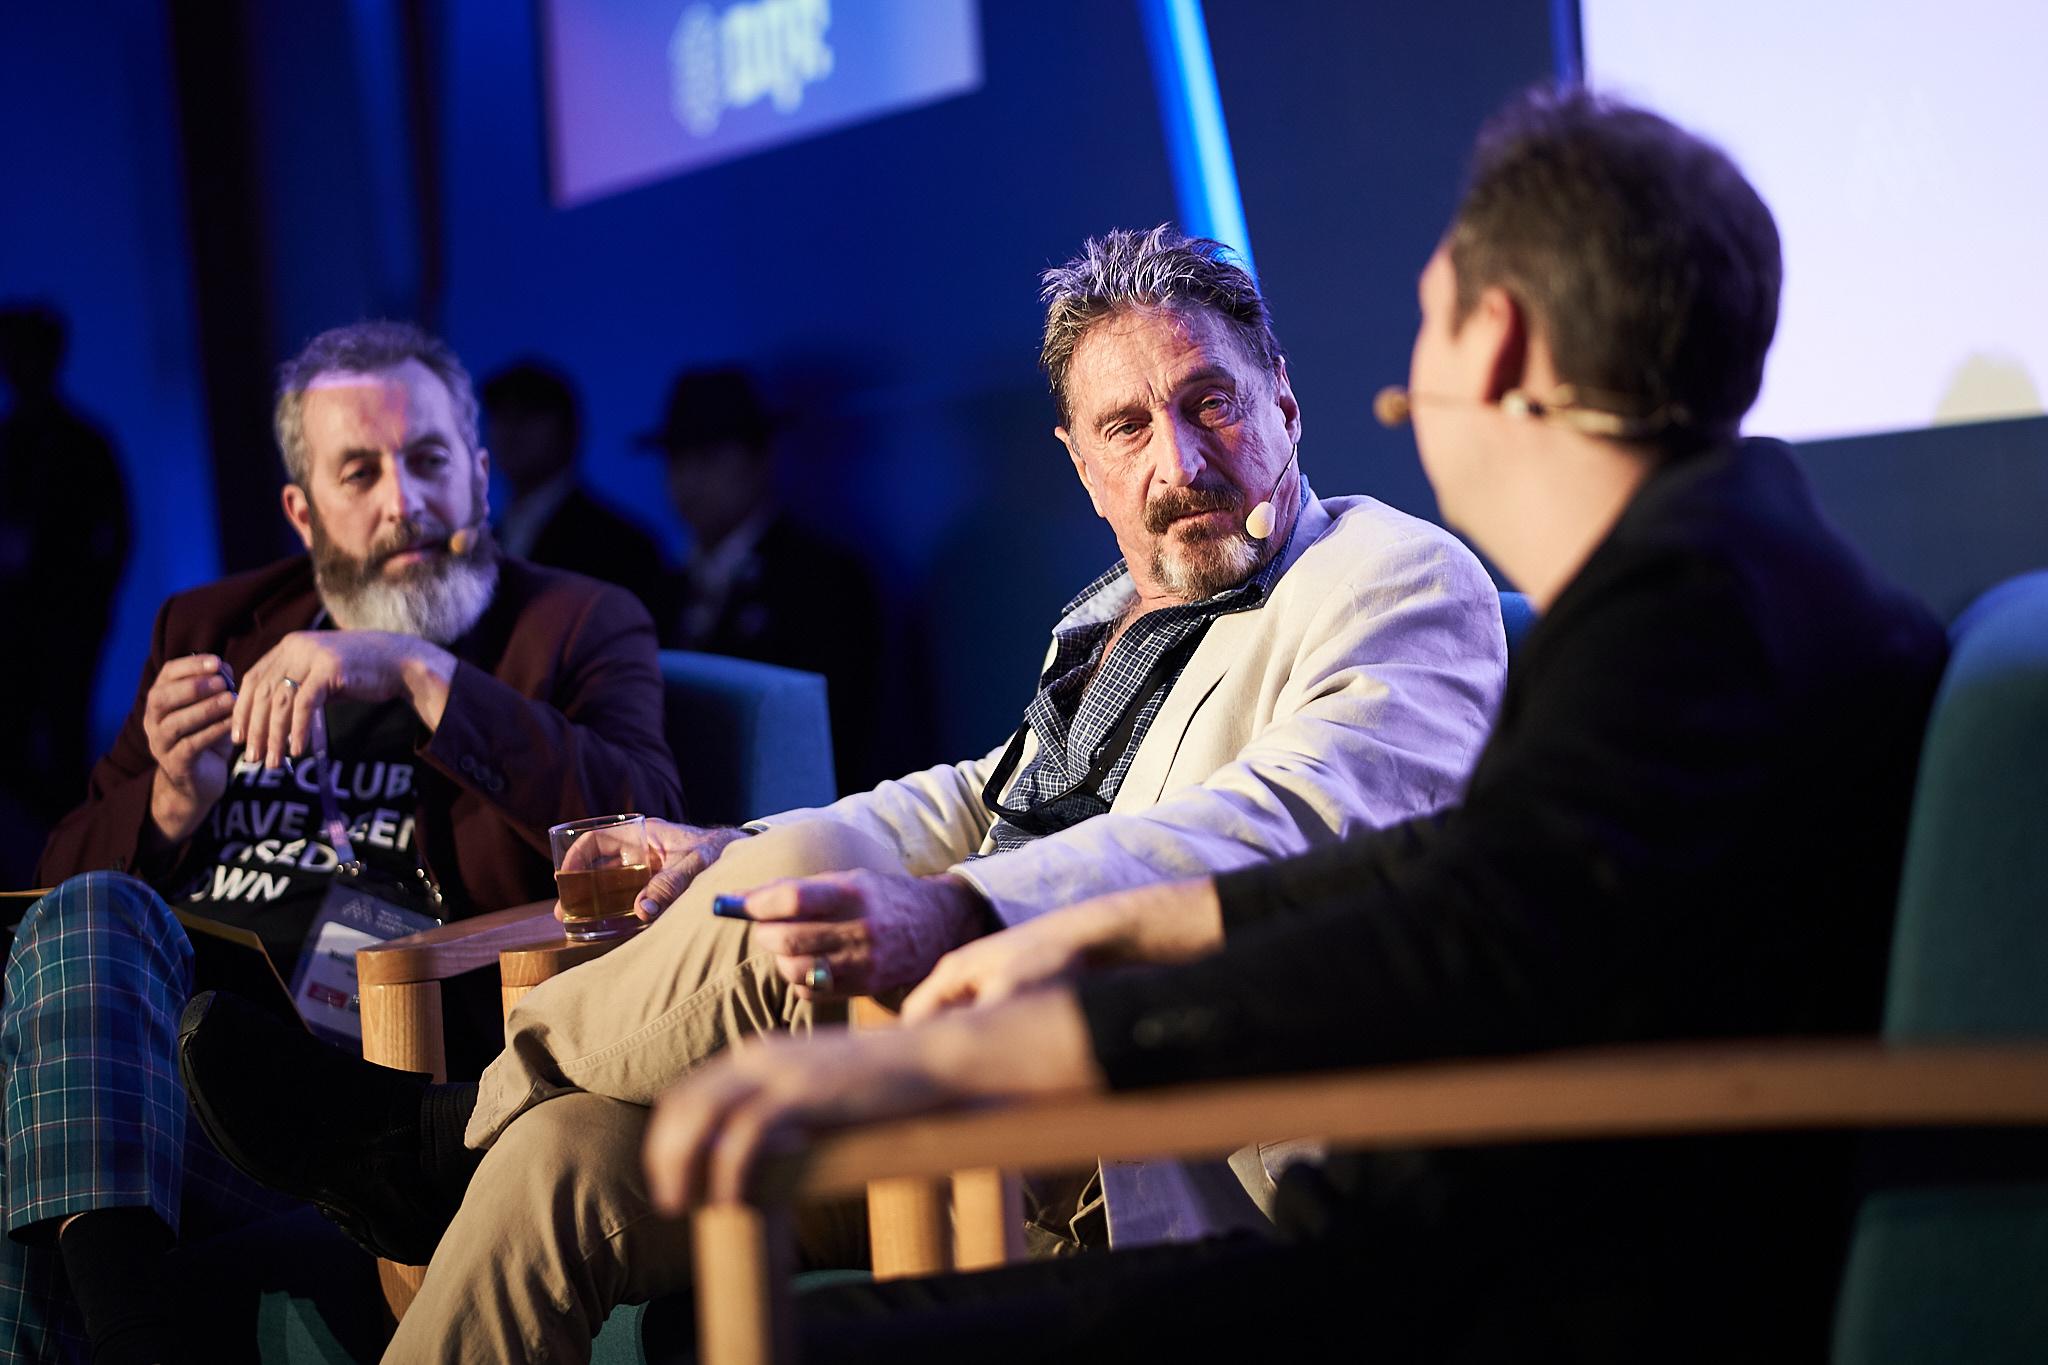 Malta Ai & Blockchain Summit Throwing Massive Show in May